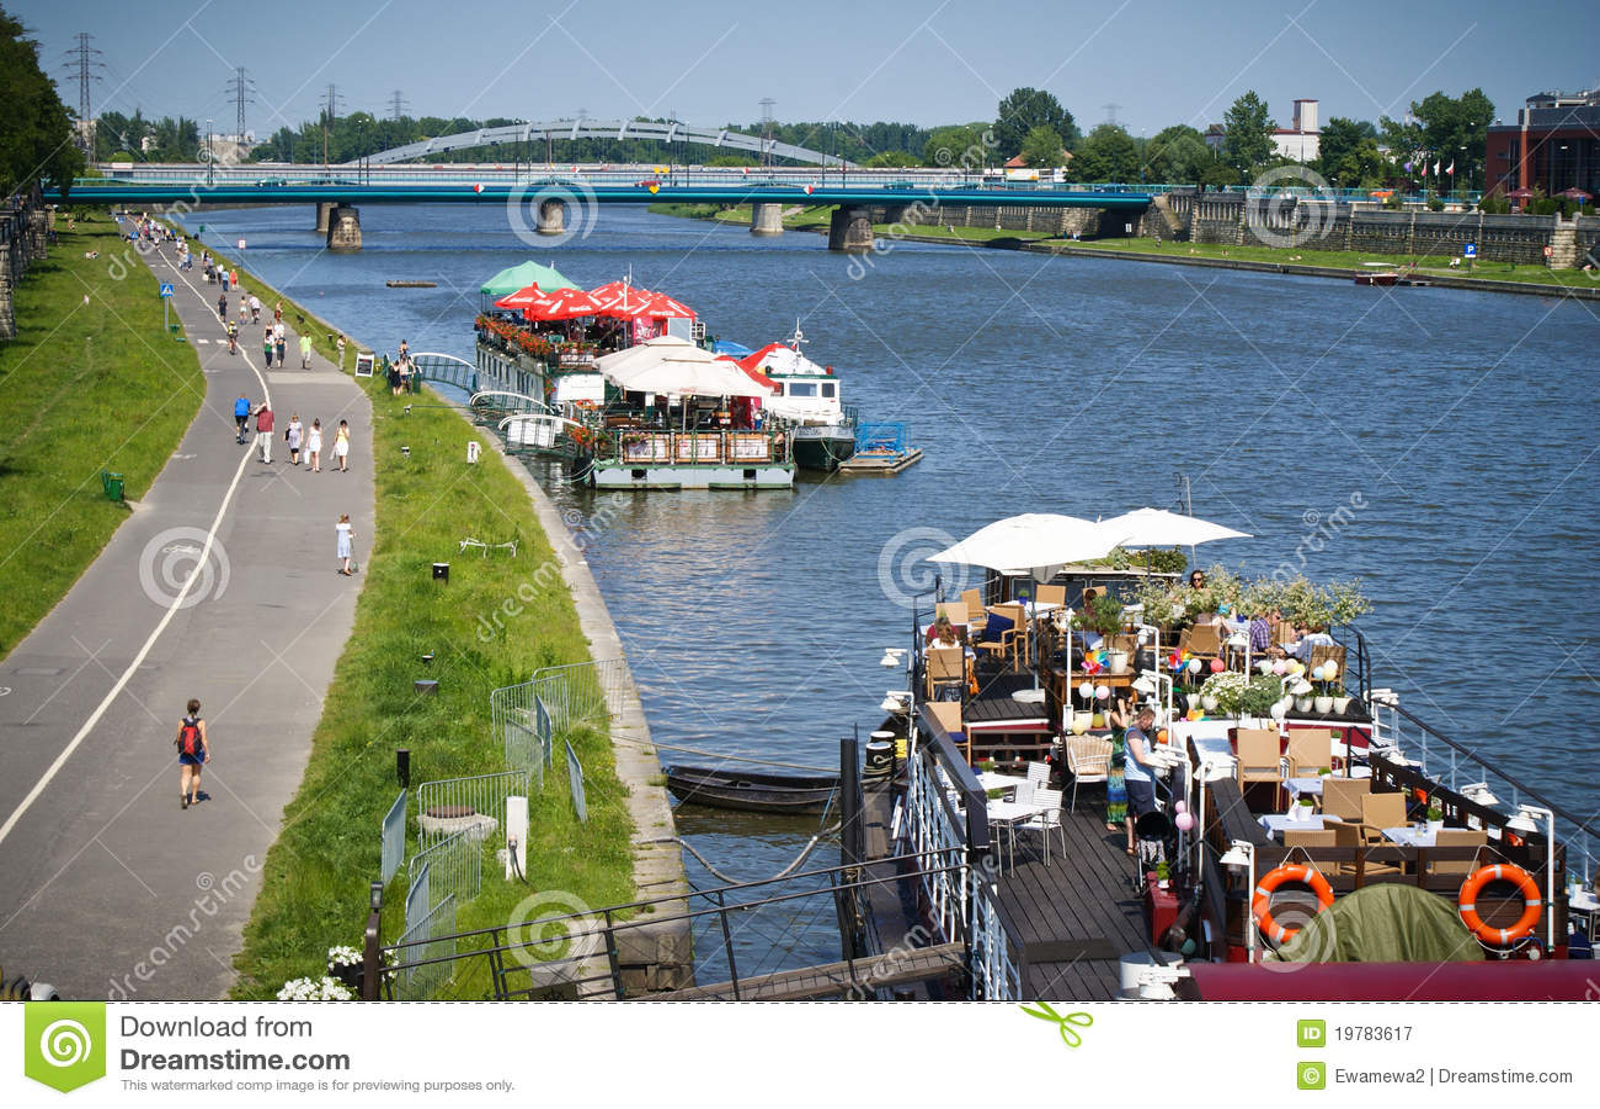 Wisla Krakow: Vistula/Wisla River Promenade, Krakow, Poland Editorial